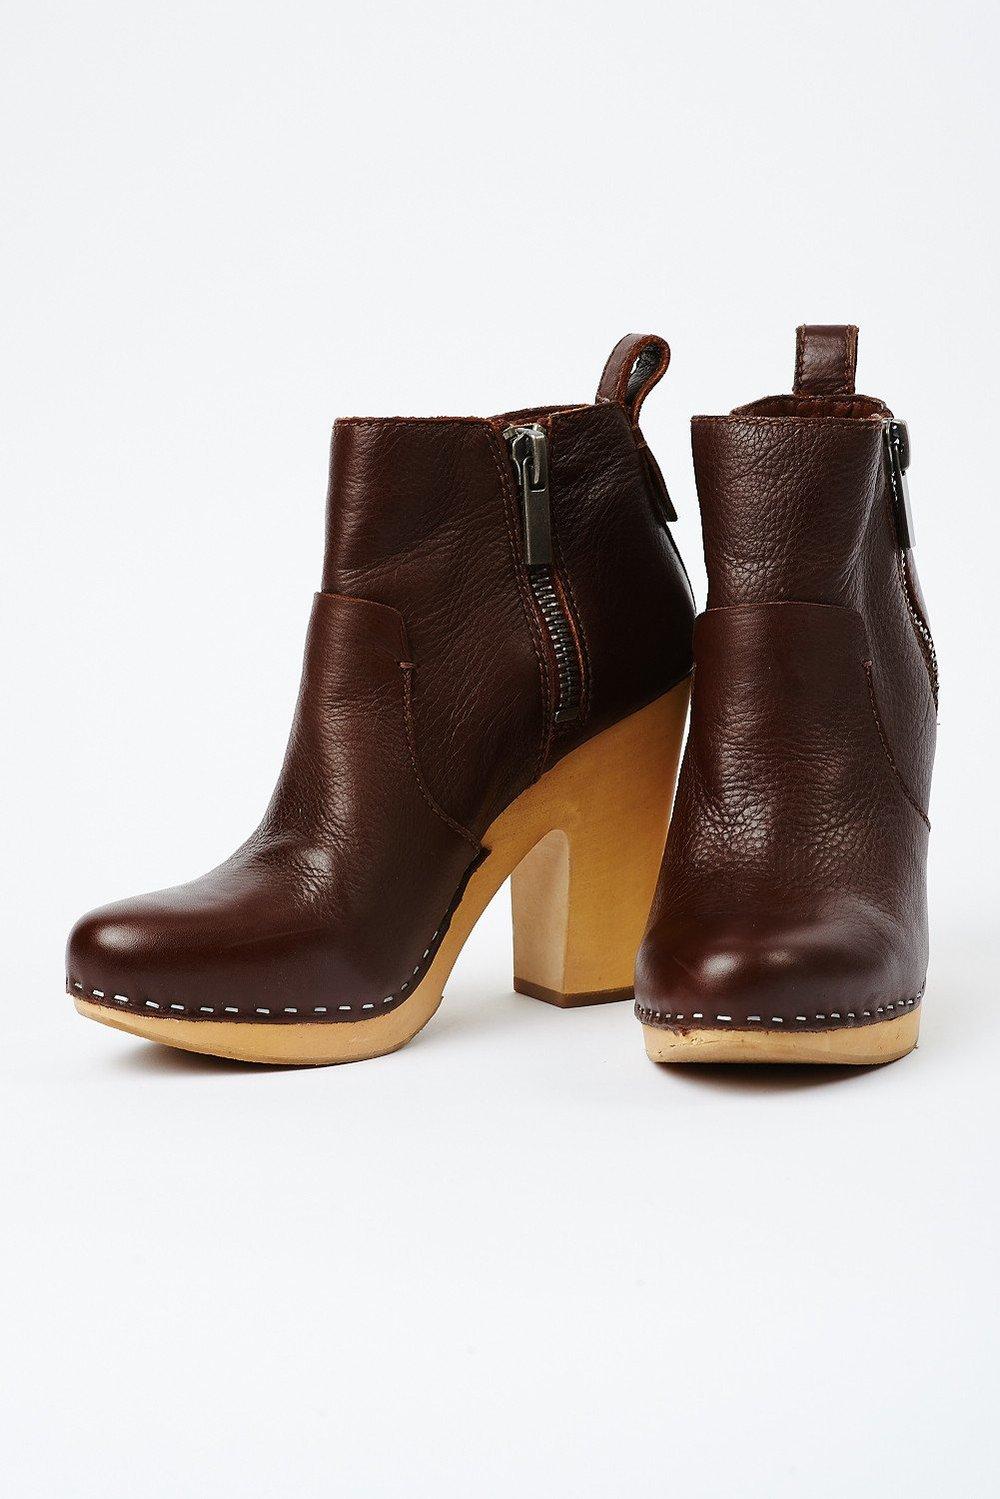 Arlynn Booties - $90